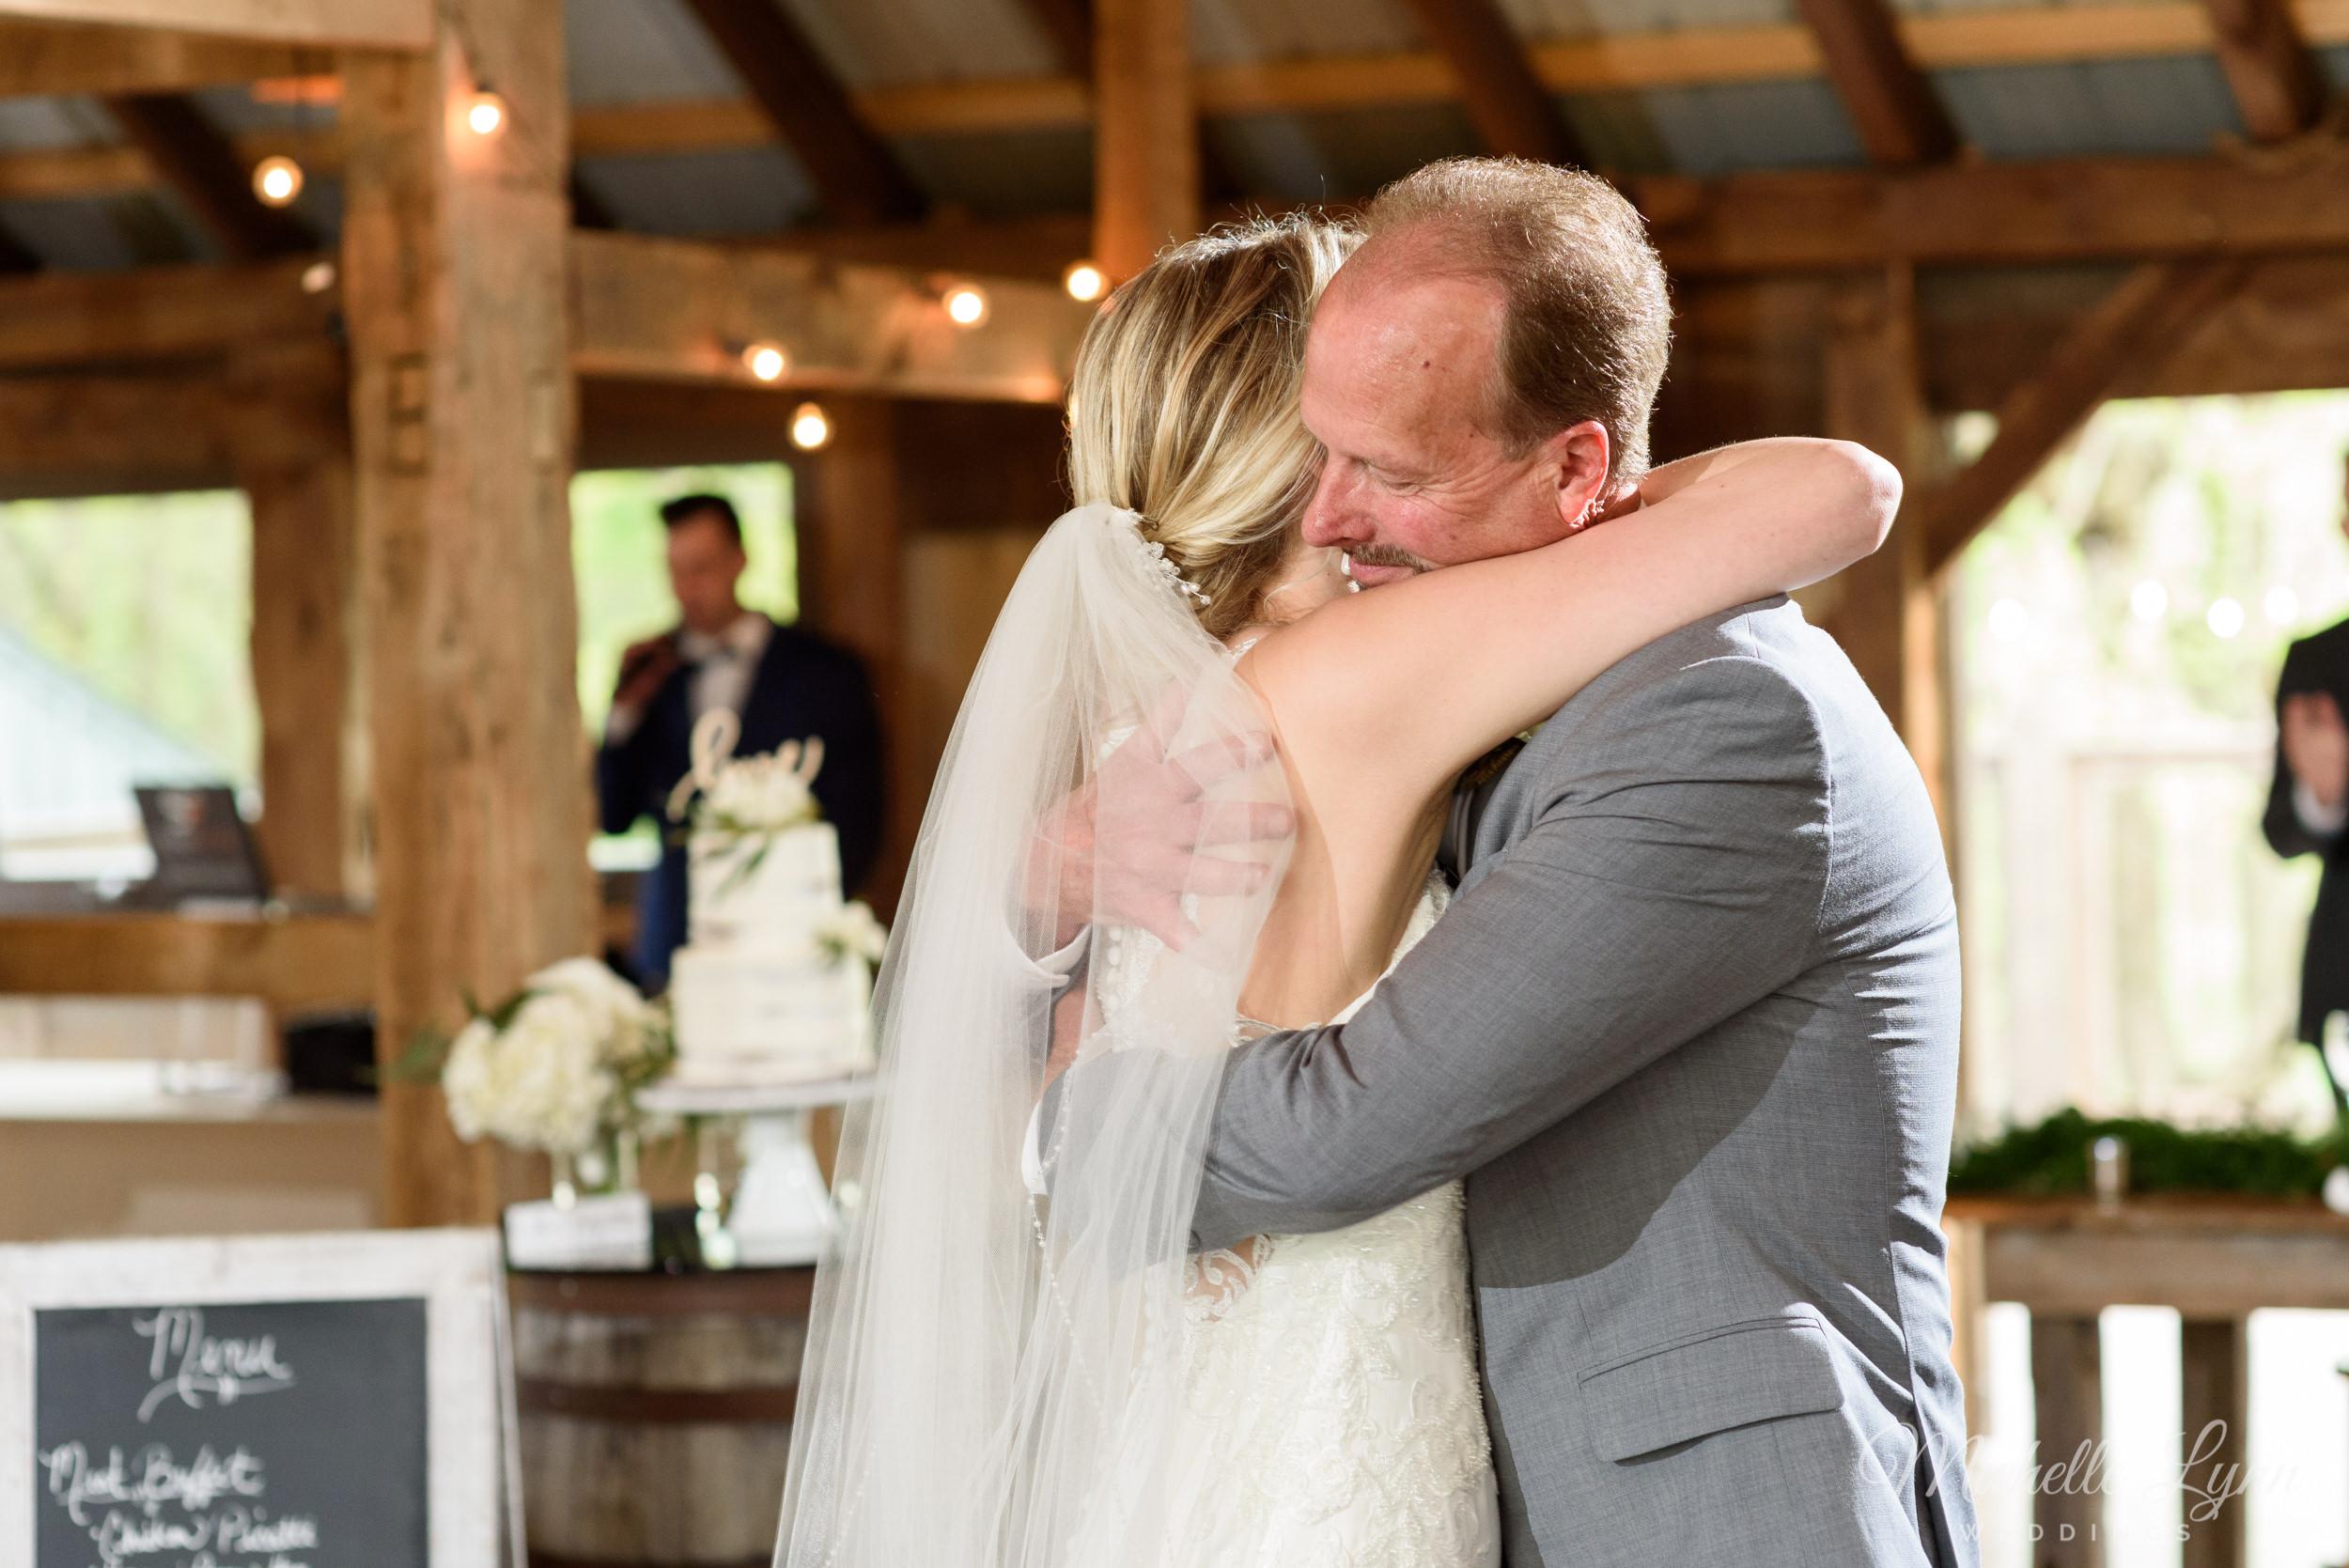 mlw-the-farm-bakery-and-events-wedding-photos-65.jpg